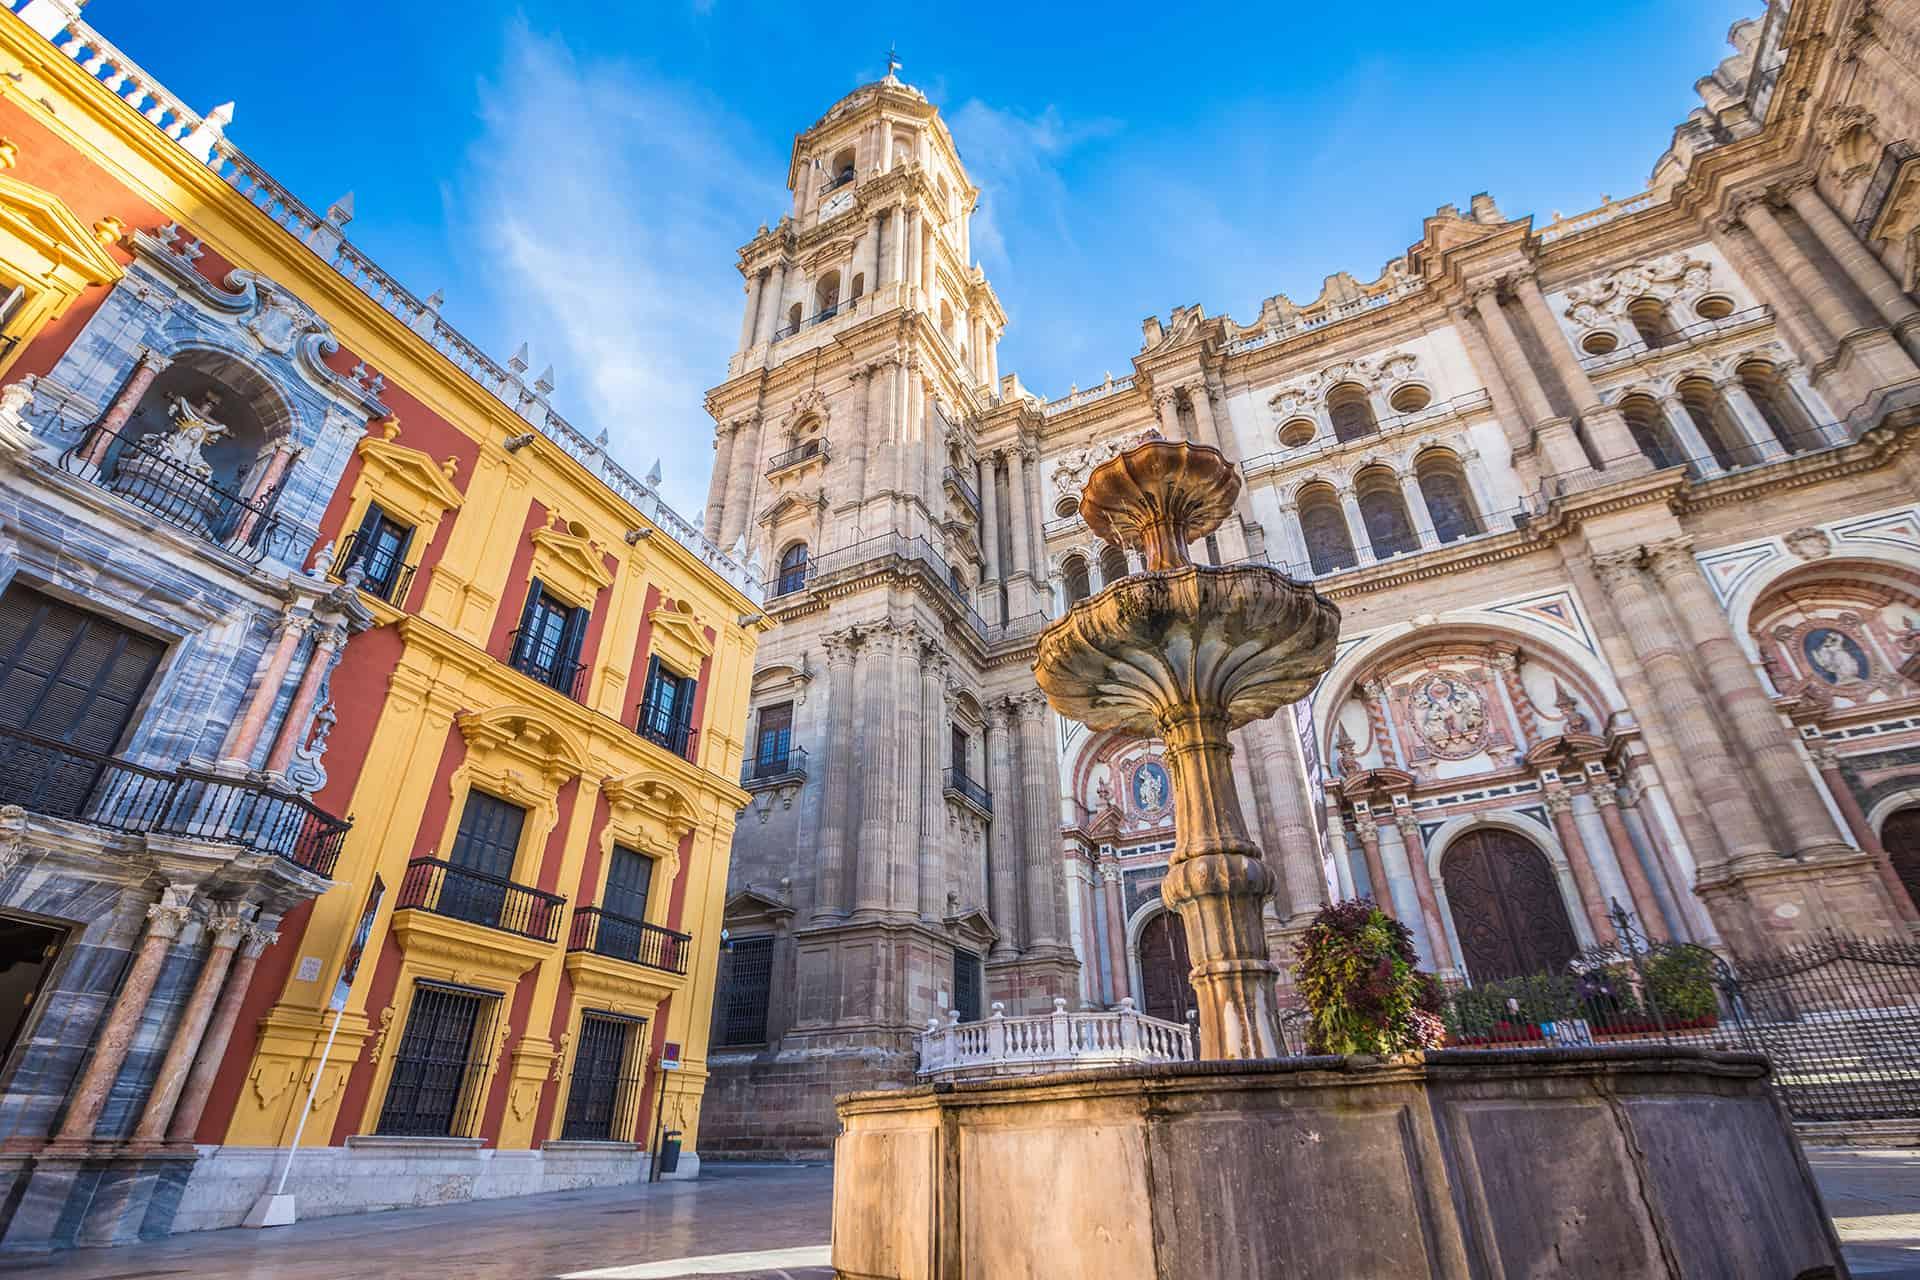 visiter andalousie en une semaine